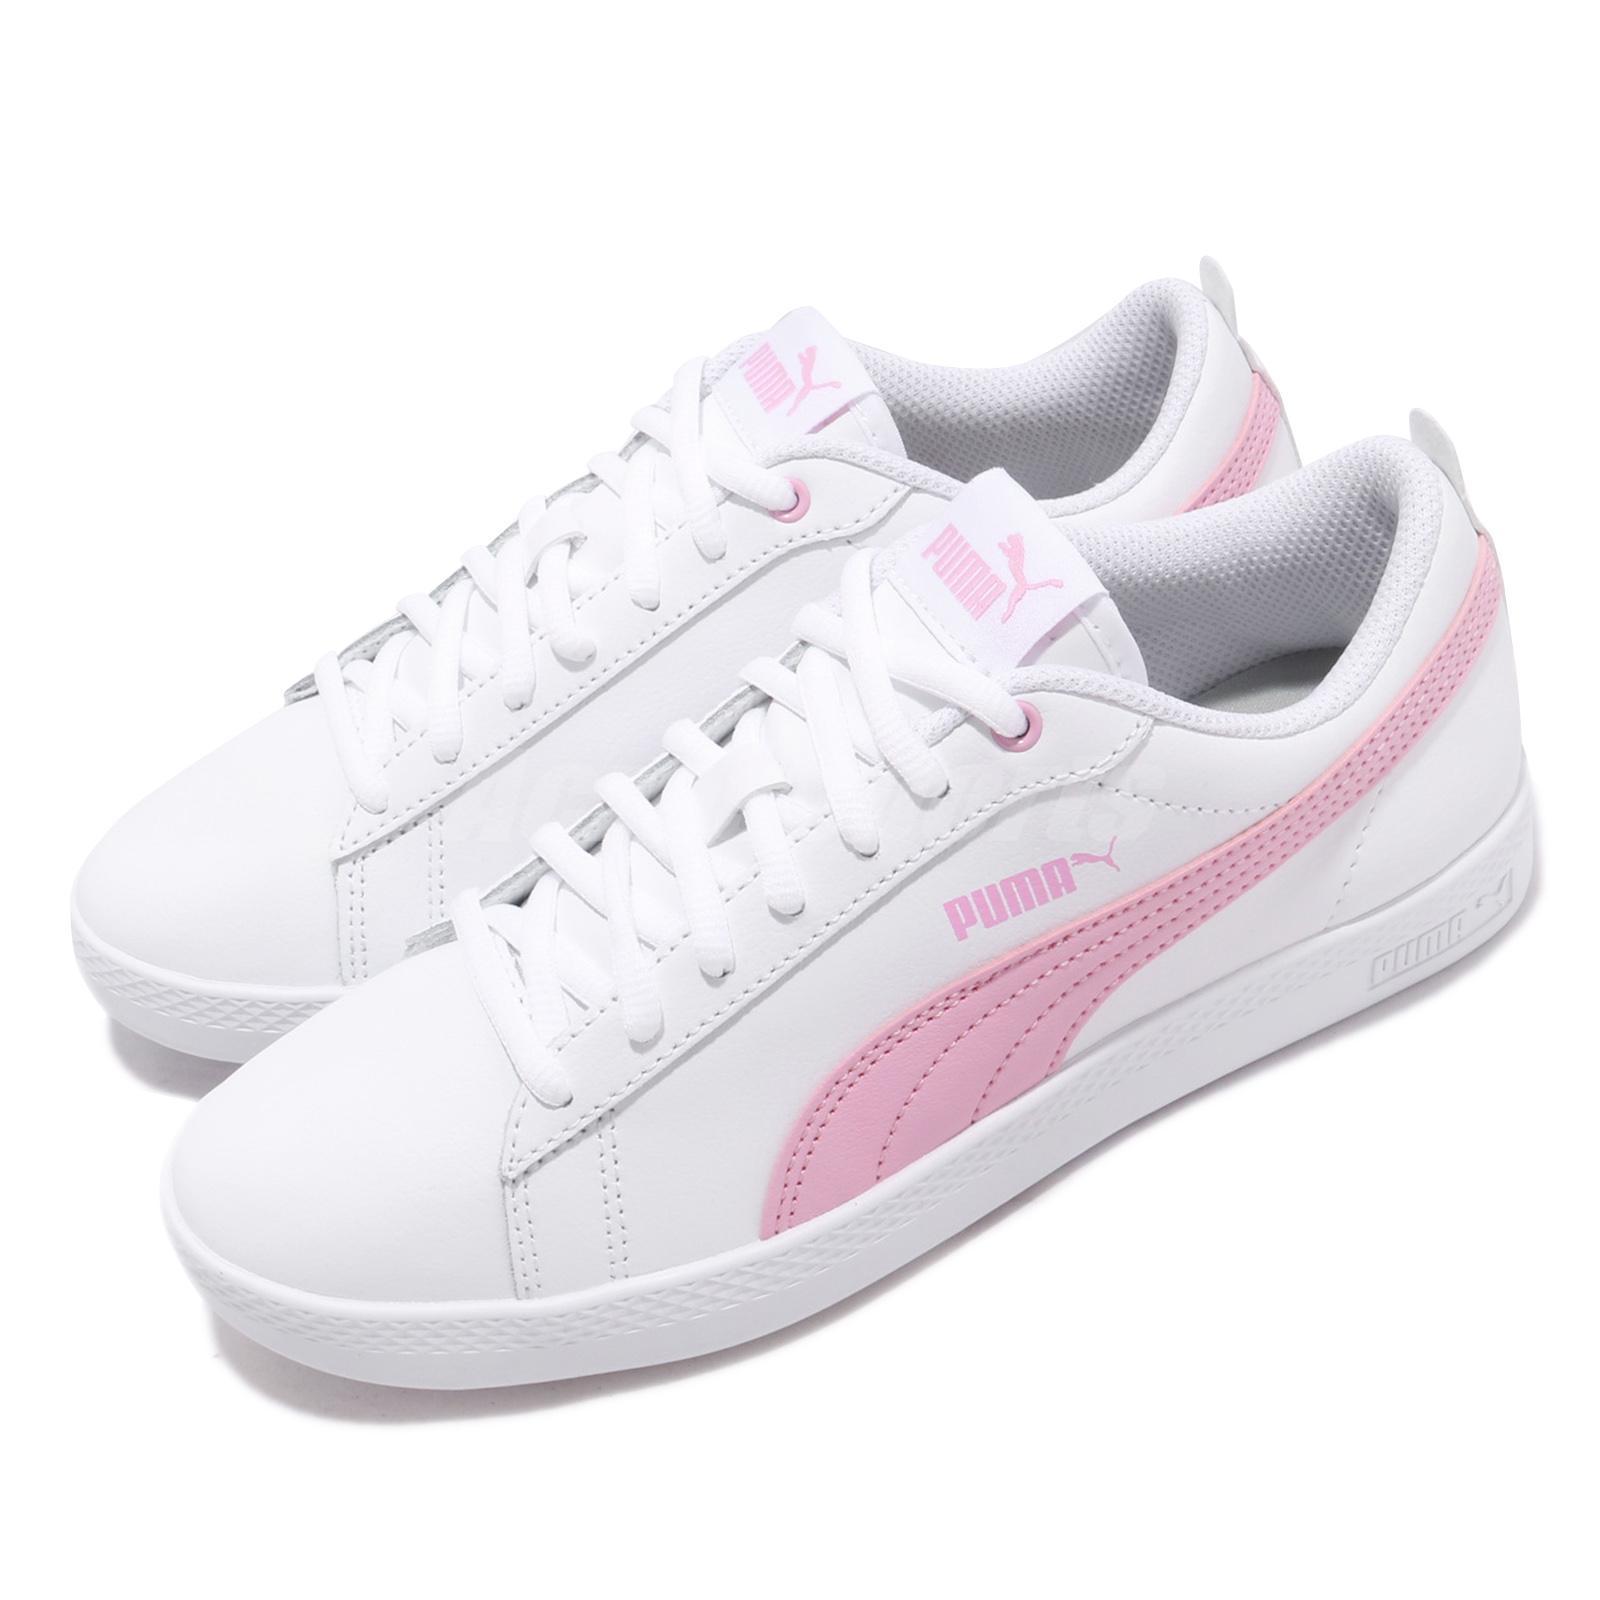 renomowana strona rozmiar 40 nowe wydanie Details about Puma Smash Wns V2 L White Pale Pink Women Casual Shoes  Sneakers 365208-10